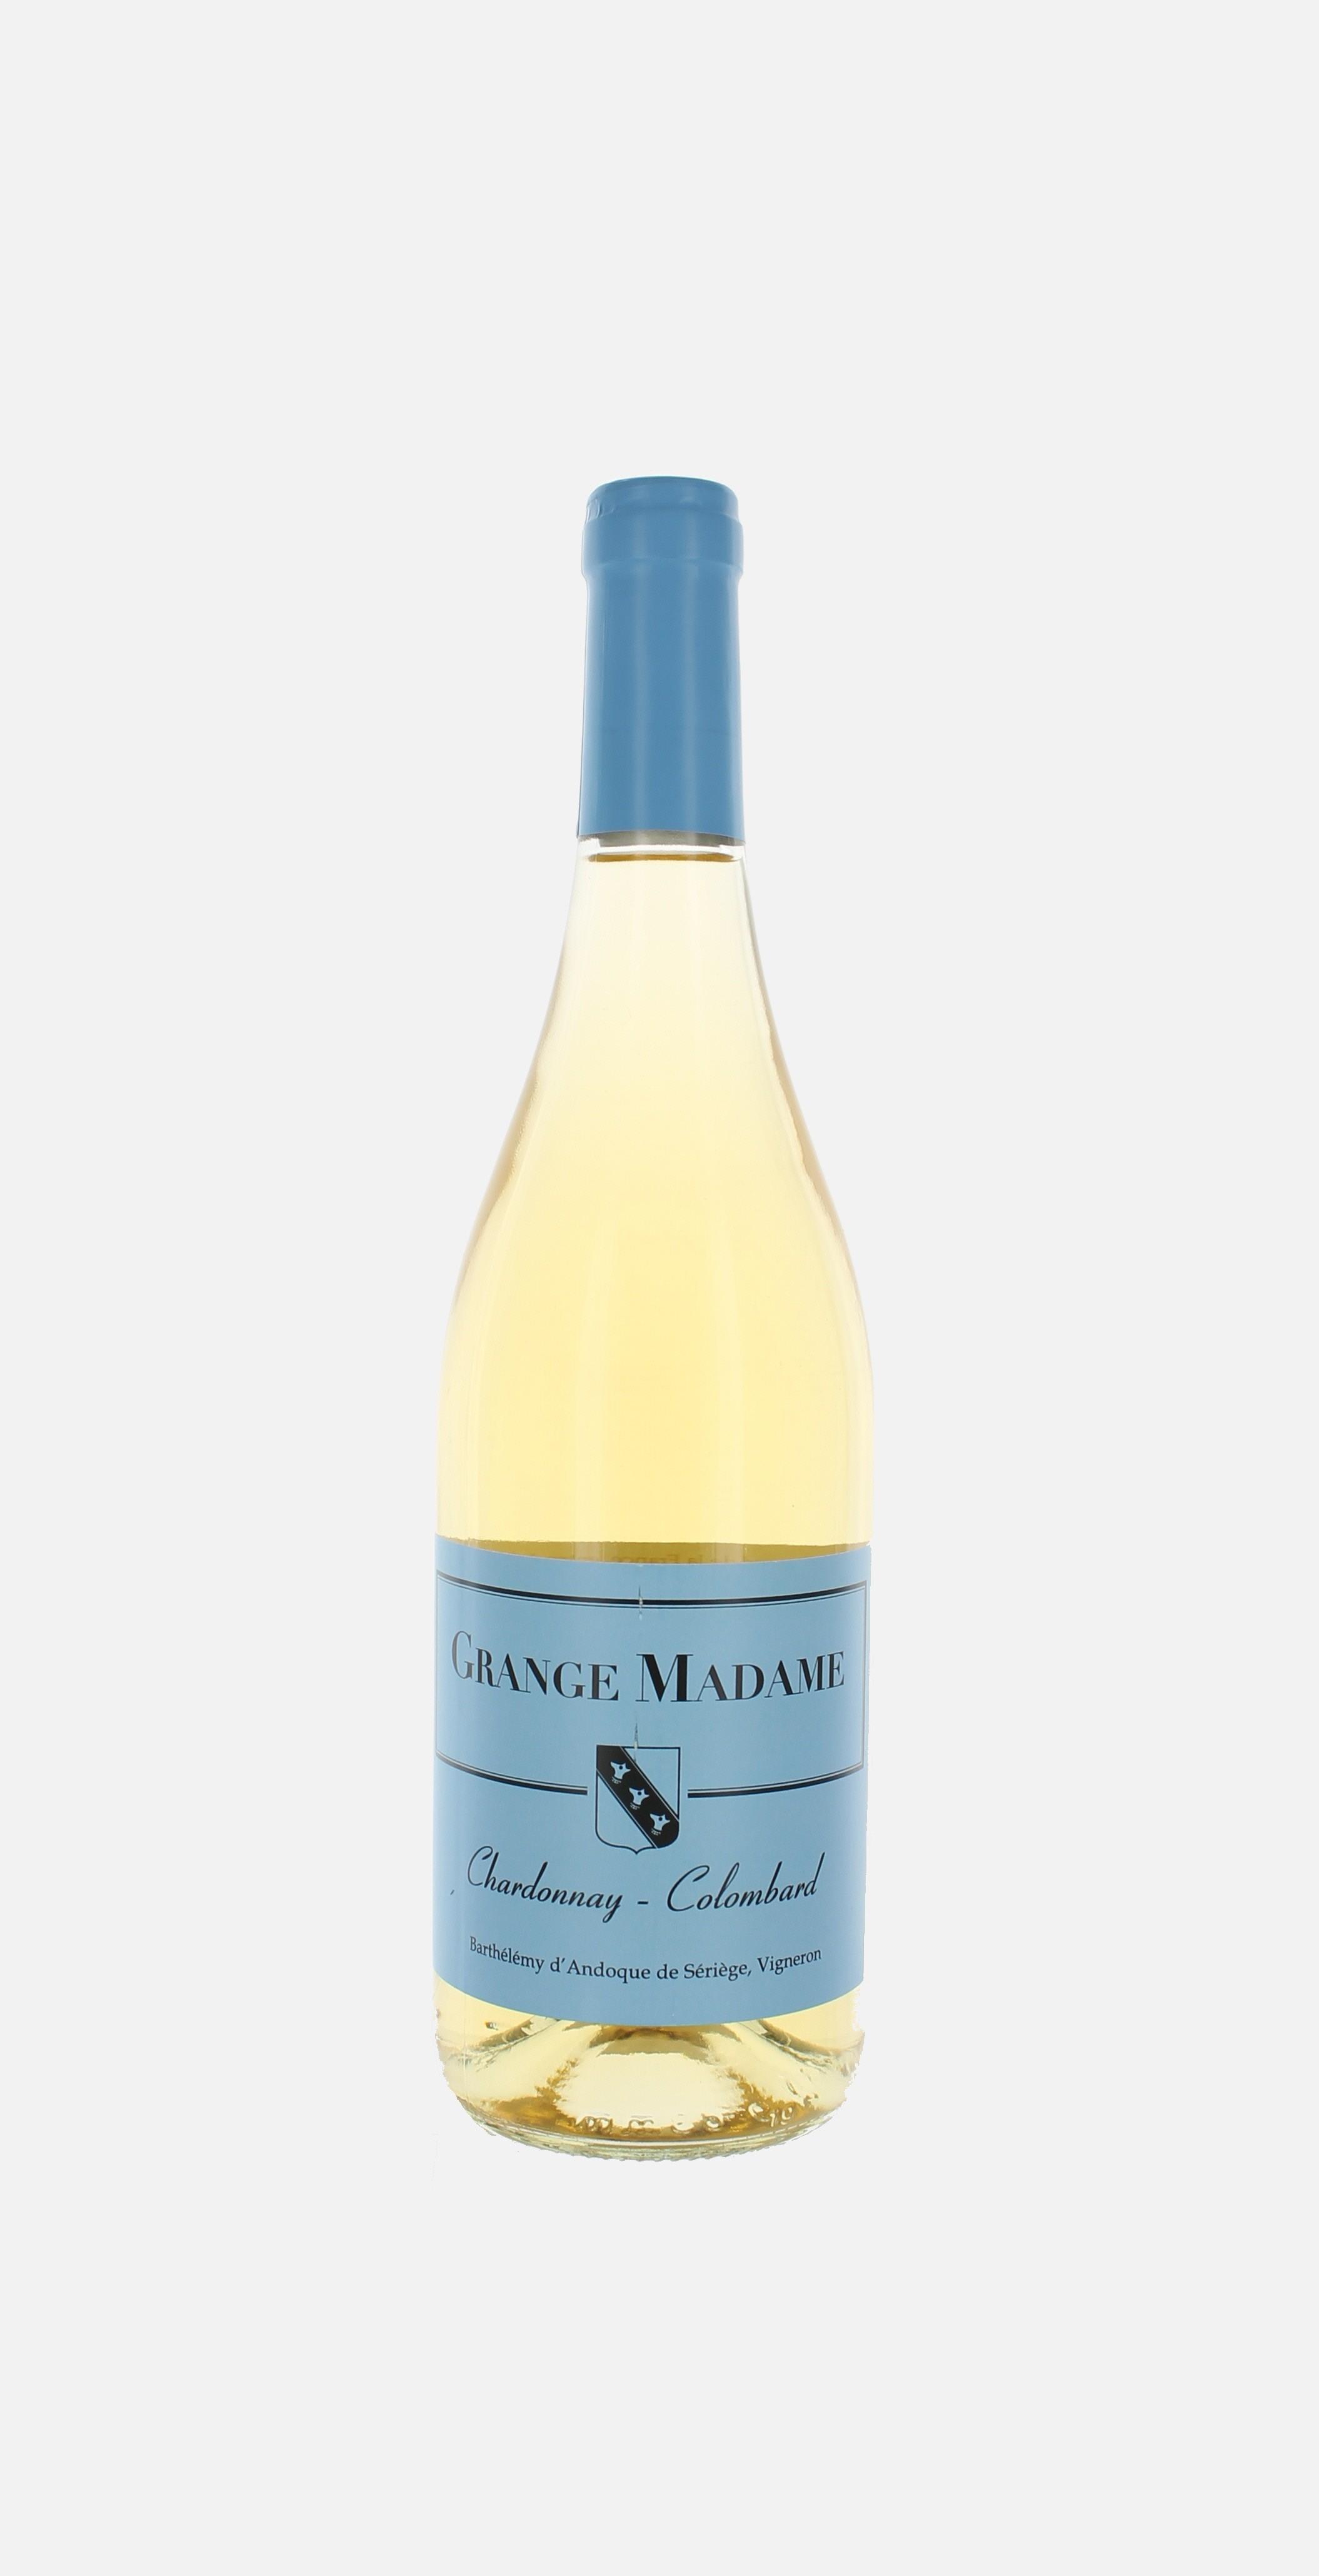 Grange Madame blanc, Chardonnay, Colombard 2015